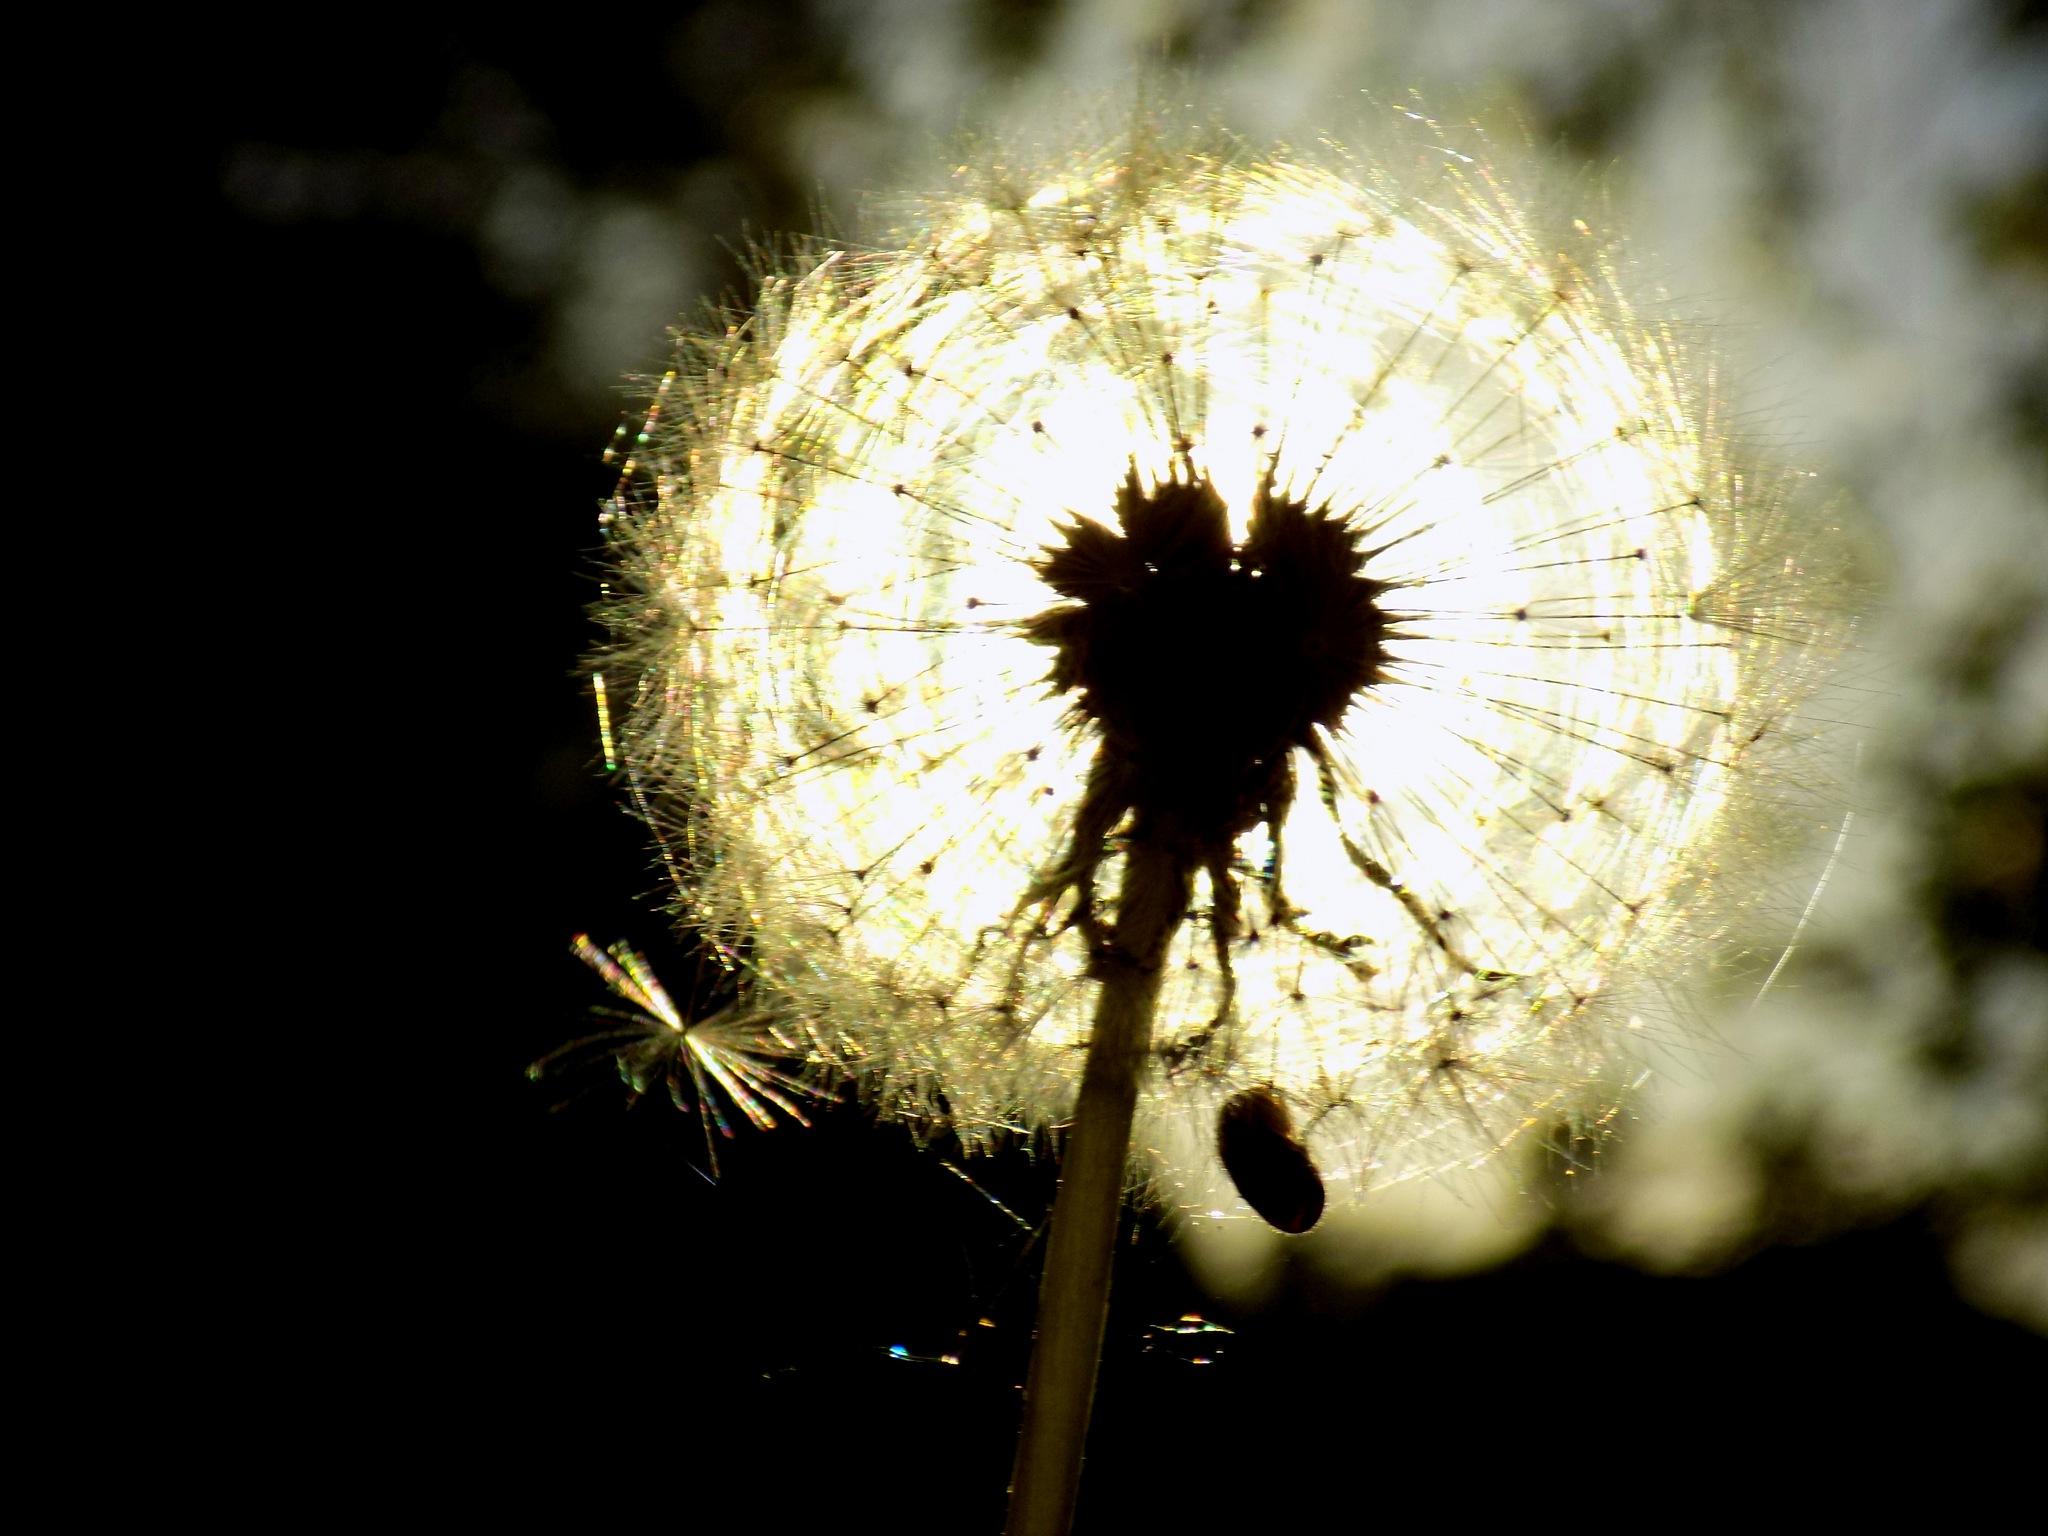 Sunlight by uzkuraitiene62